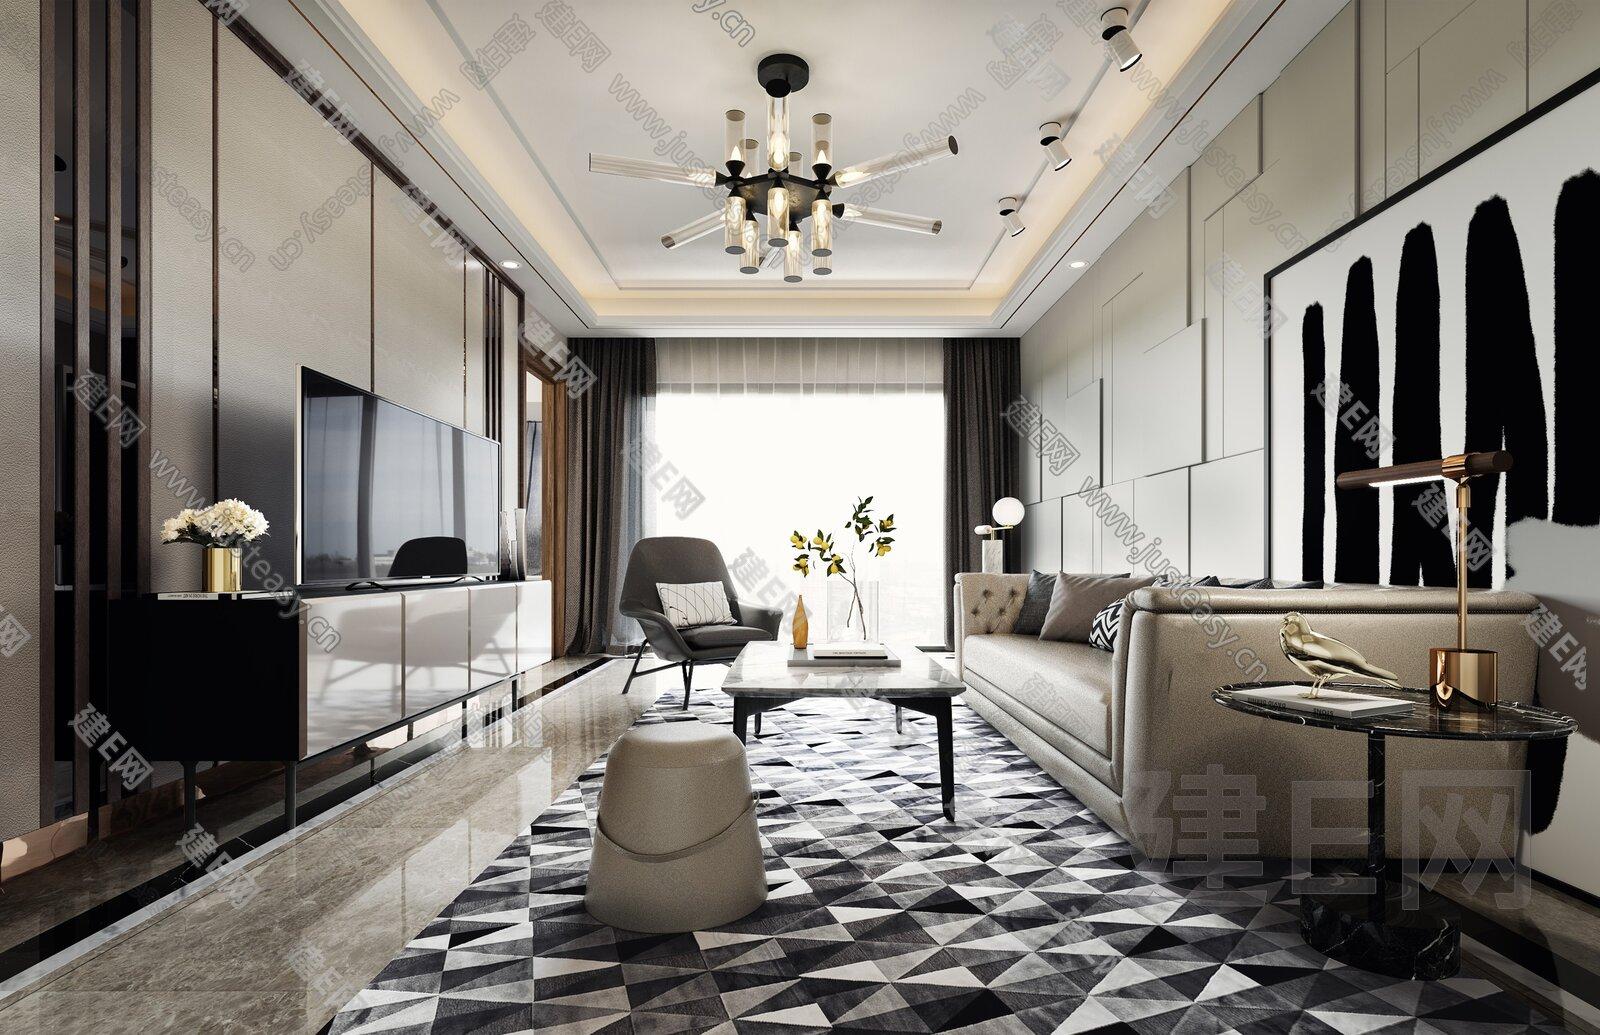 GND设计集团 现代简约样板间客厅3d模型